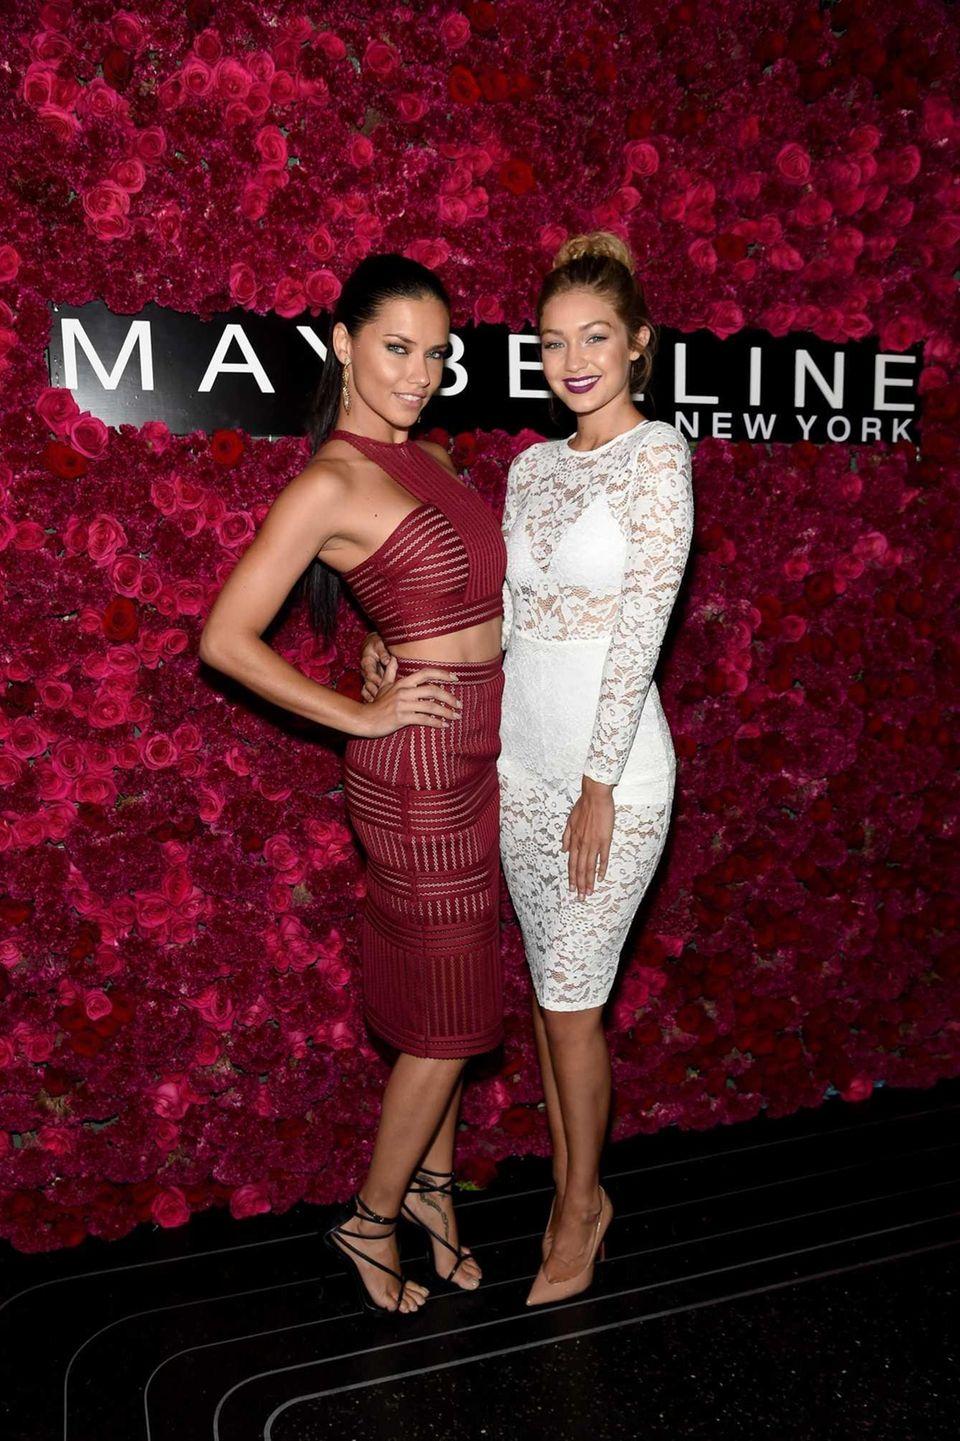 Models Adriana Lima, left, and Gigi Hadid attend